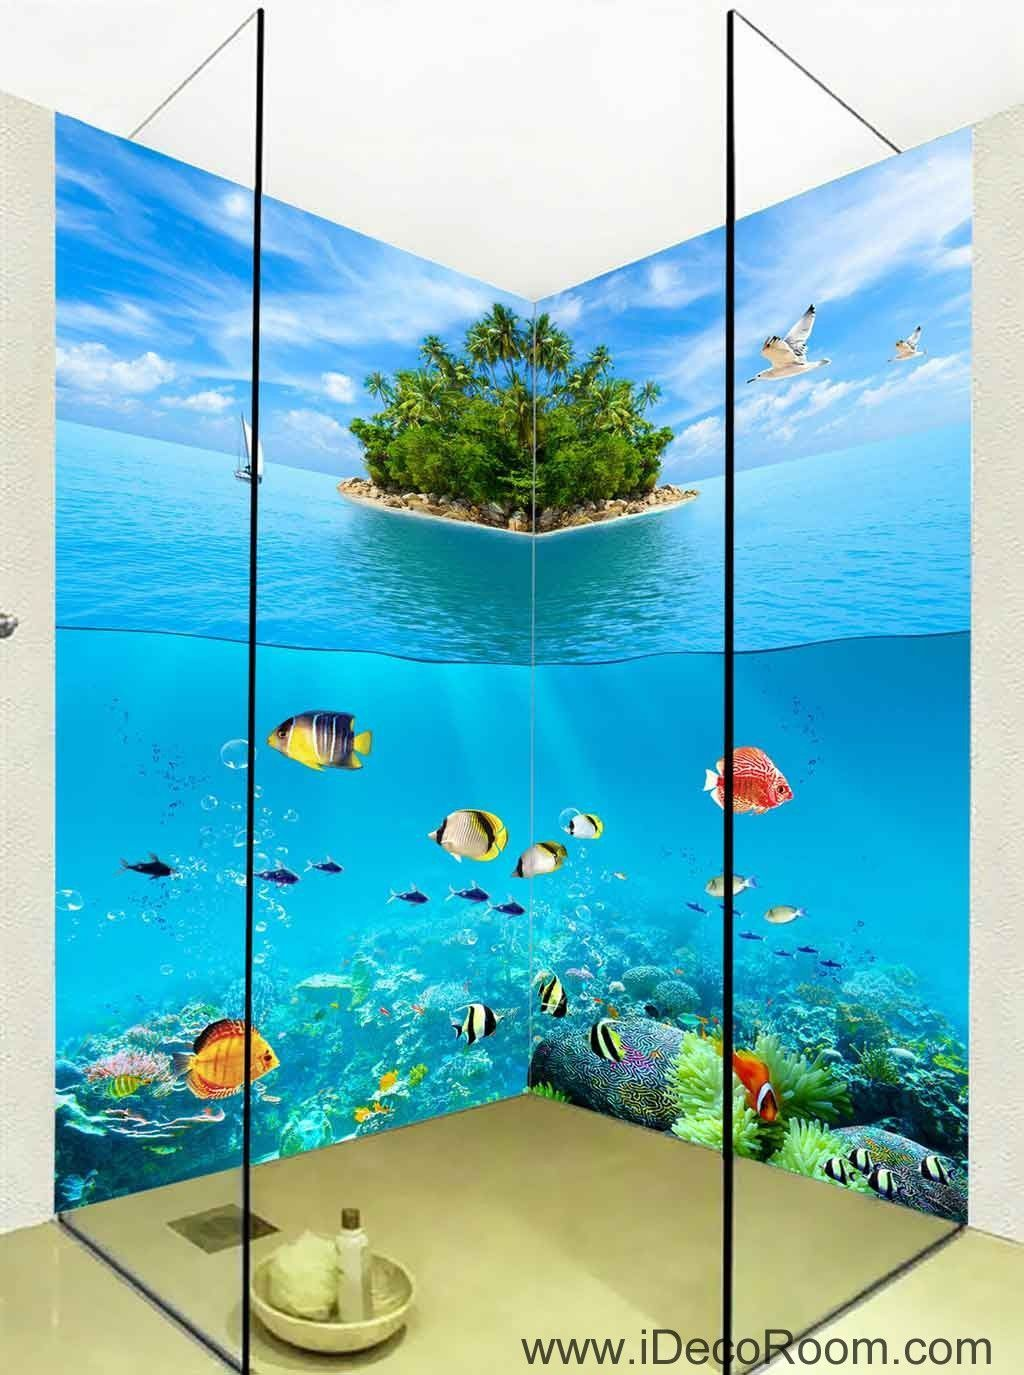 Wallpaper Undersea Fish Island Wall Murals Bathroom Decals Art Print Home Office Decor